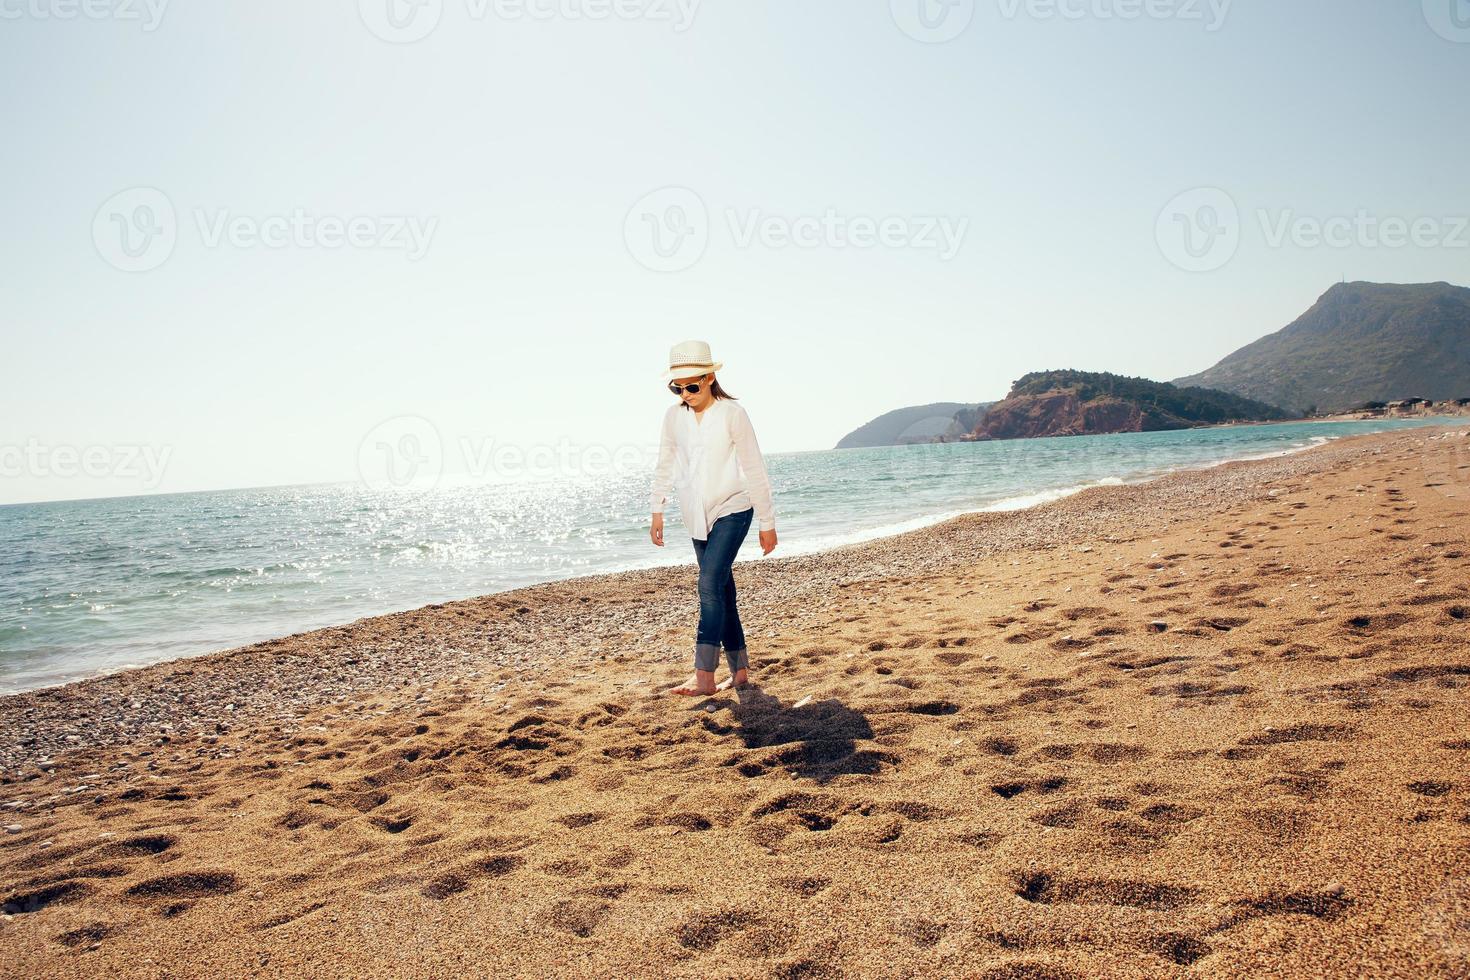 Girl walking on beach photo